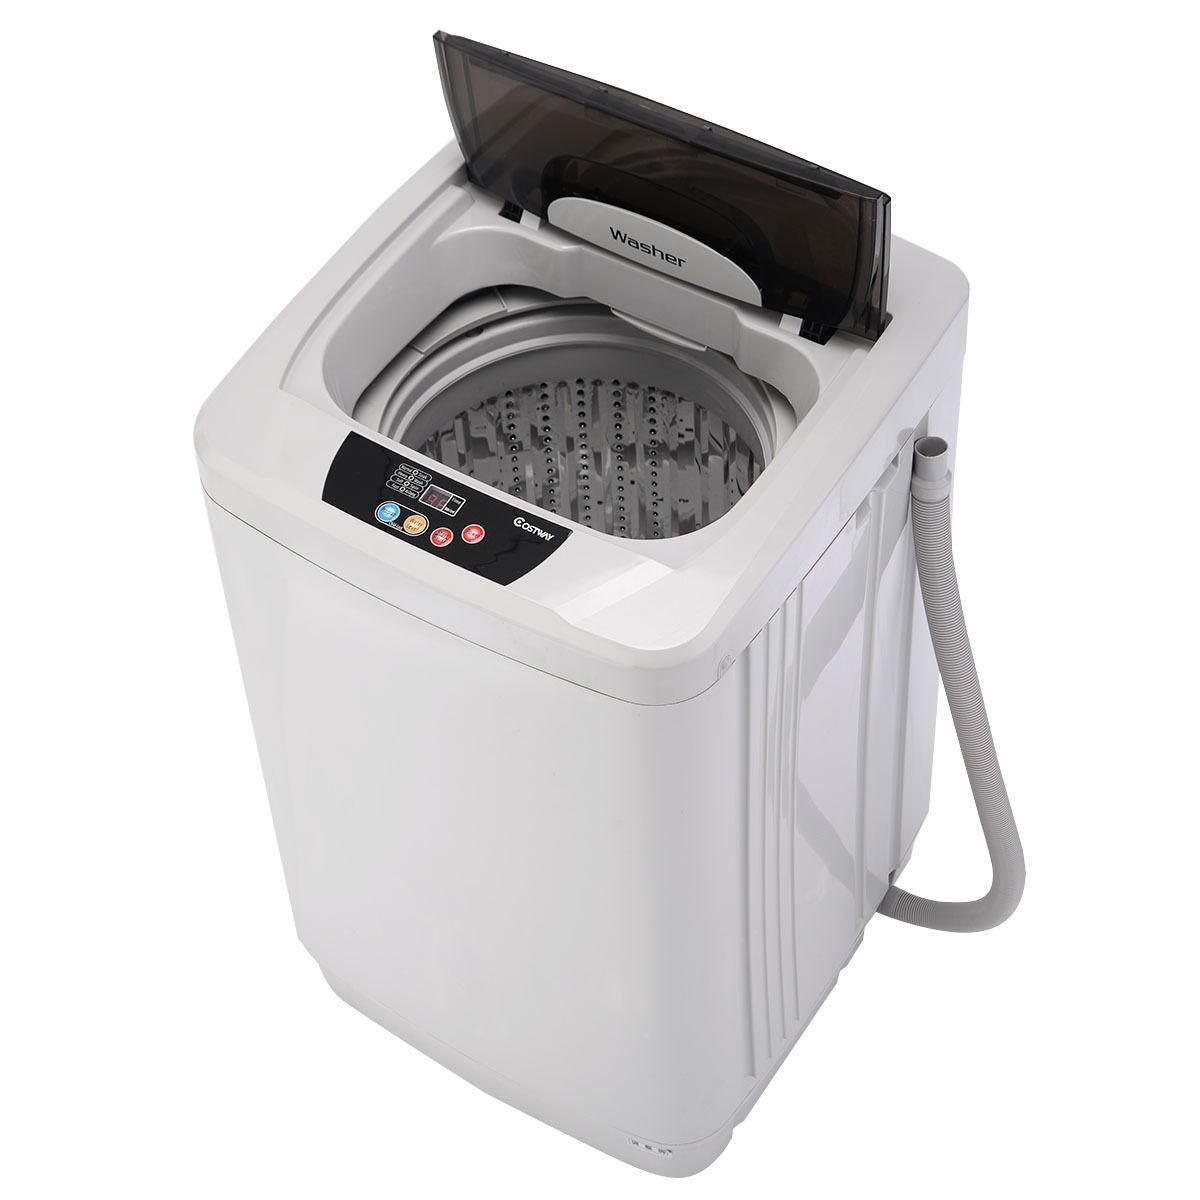 portable c washing machine